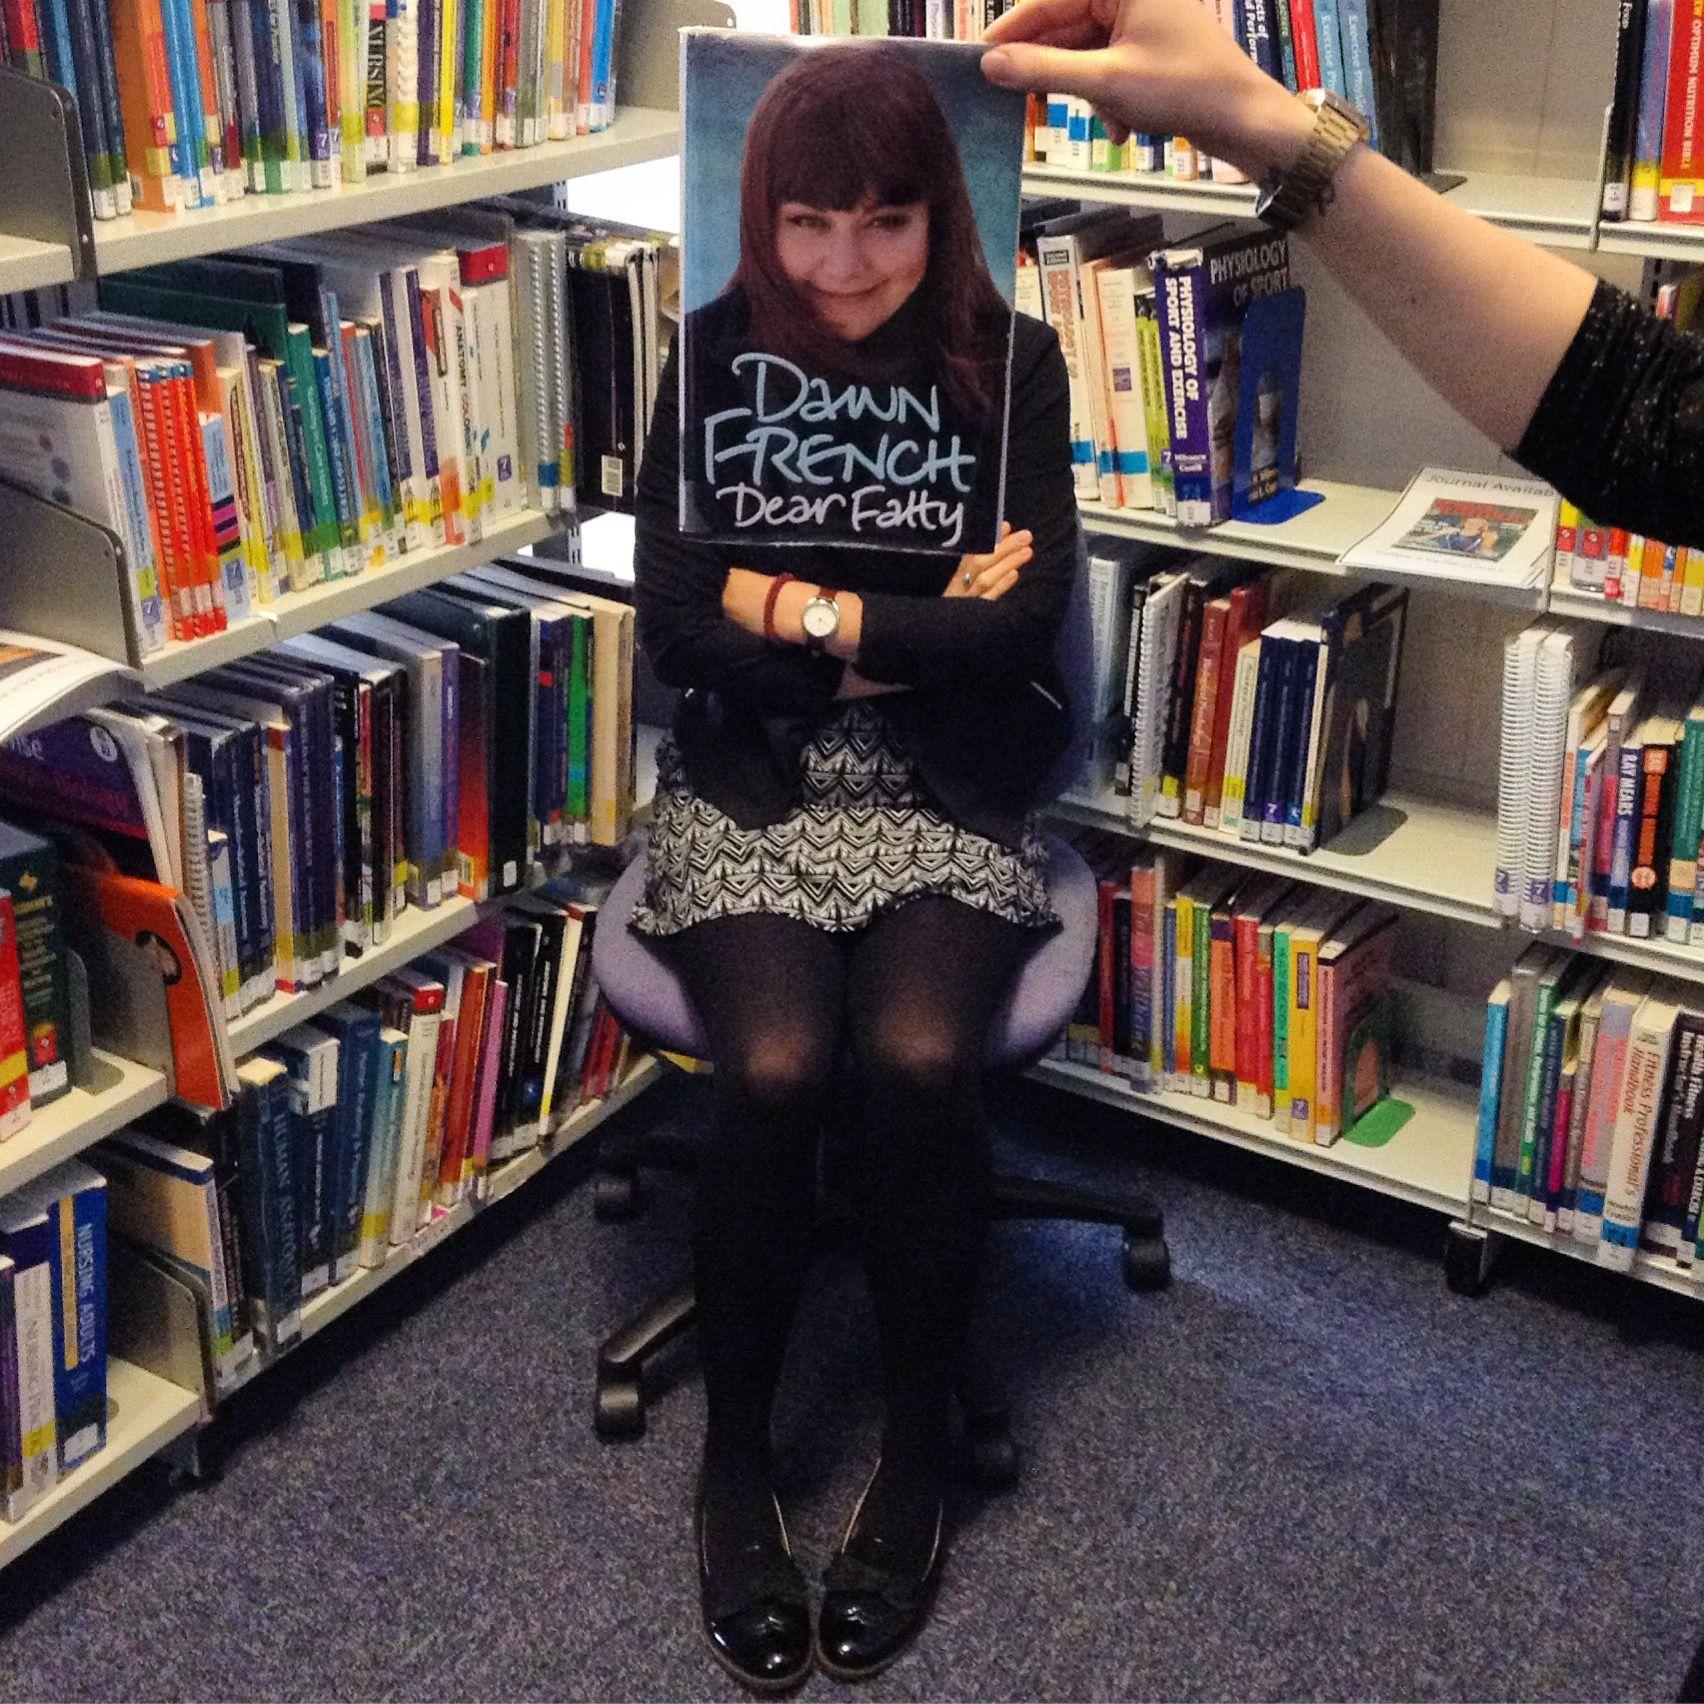 Dawn French #bookfacefriday South Devon College